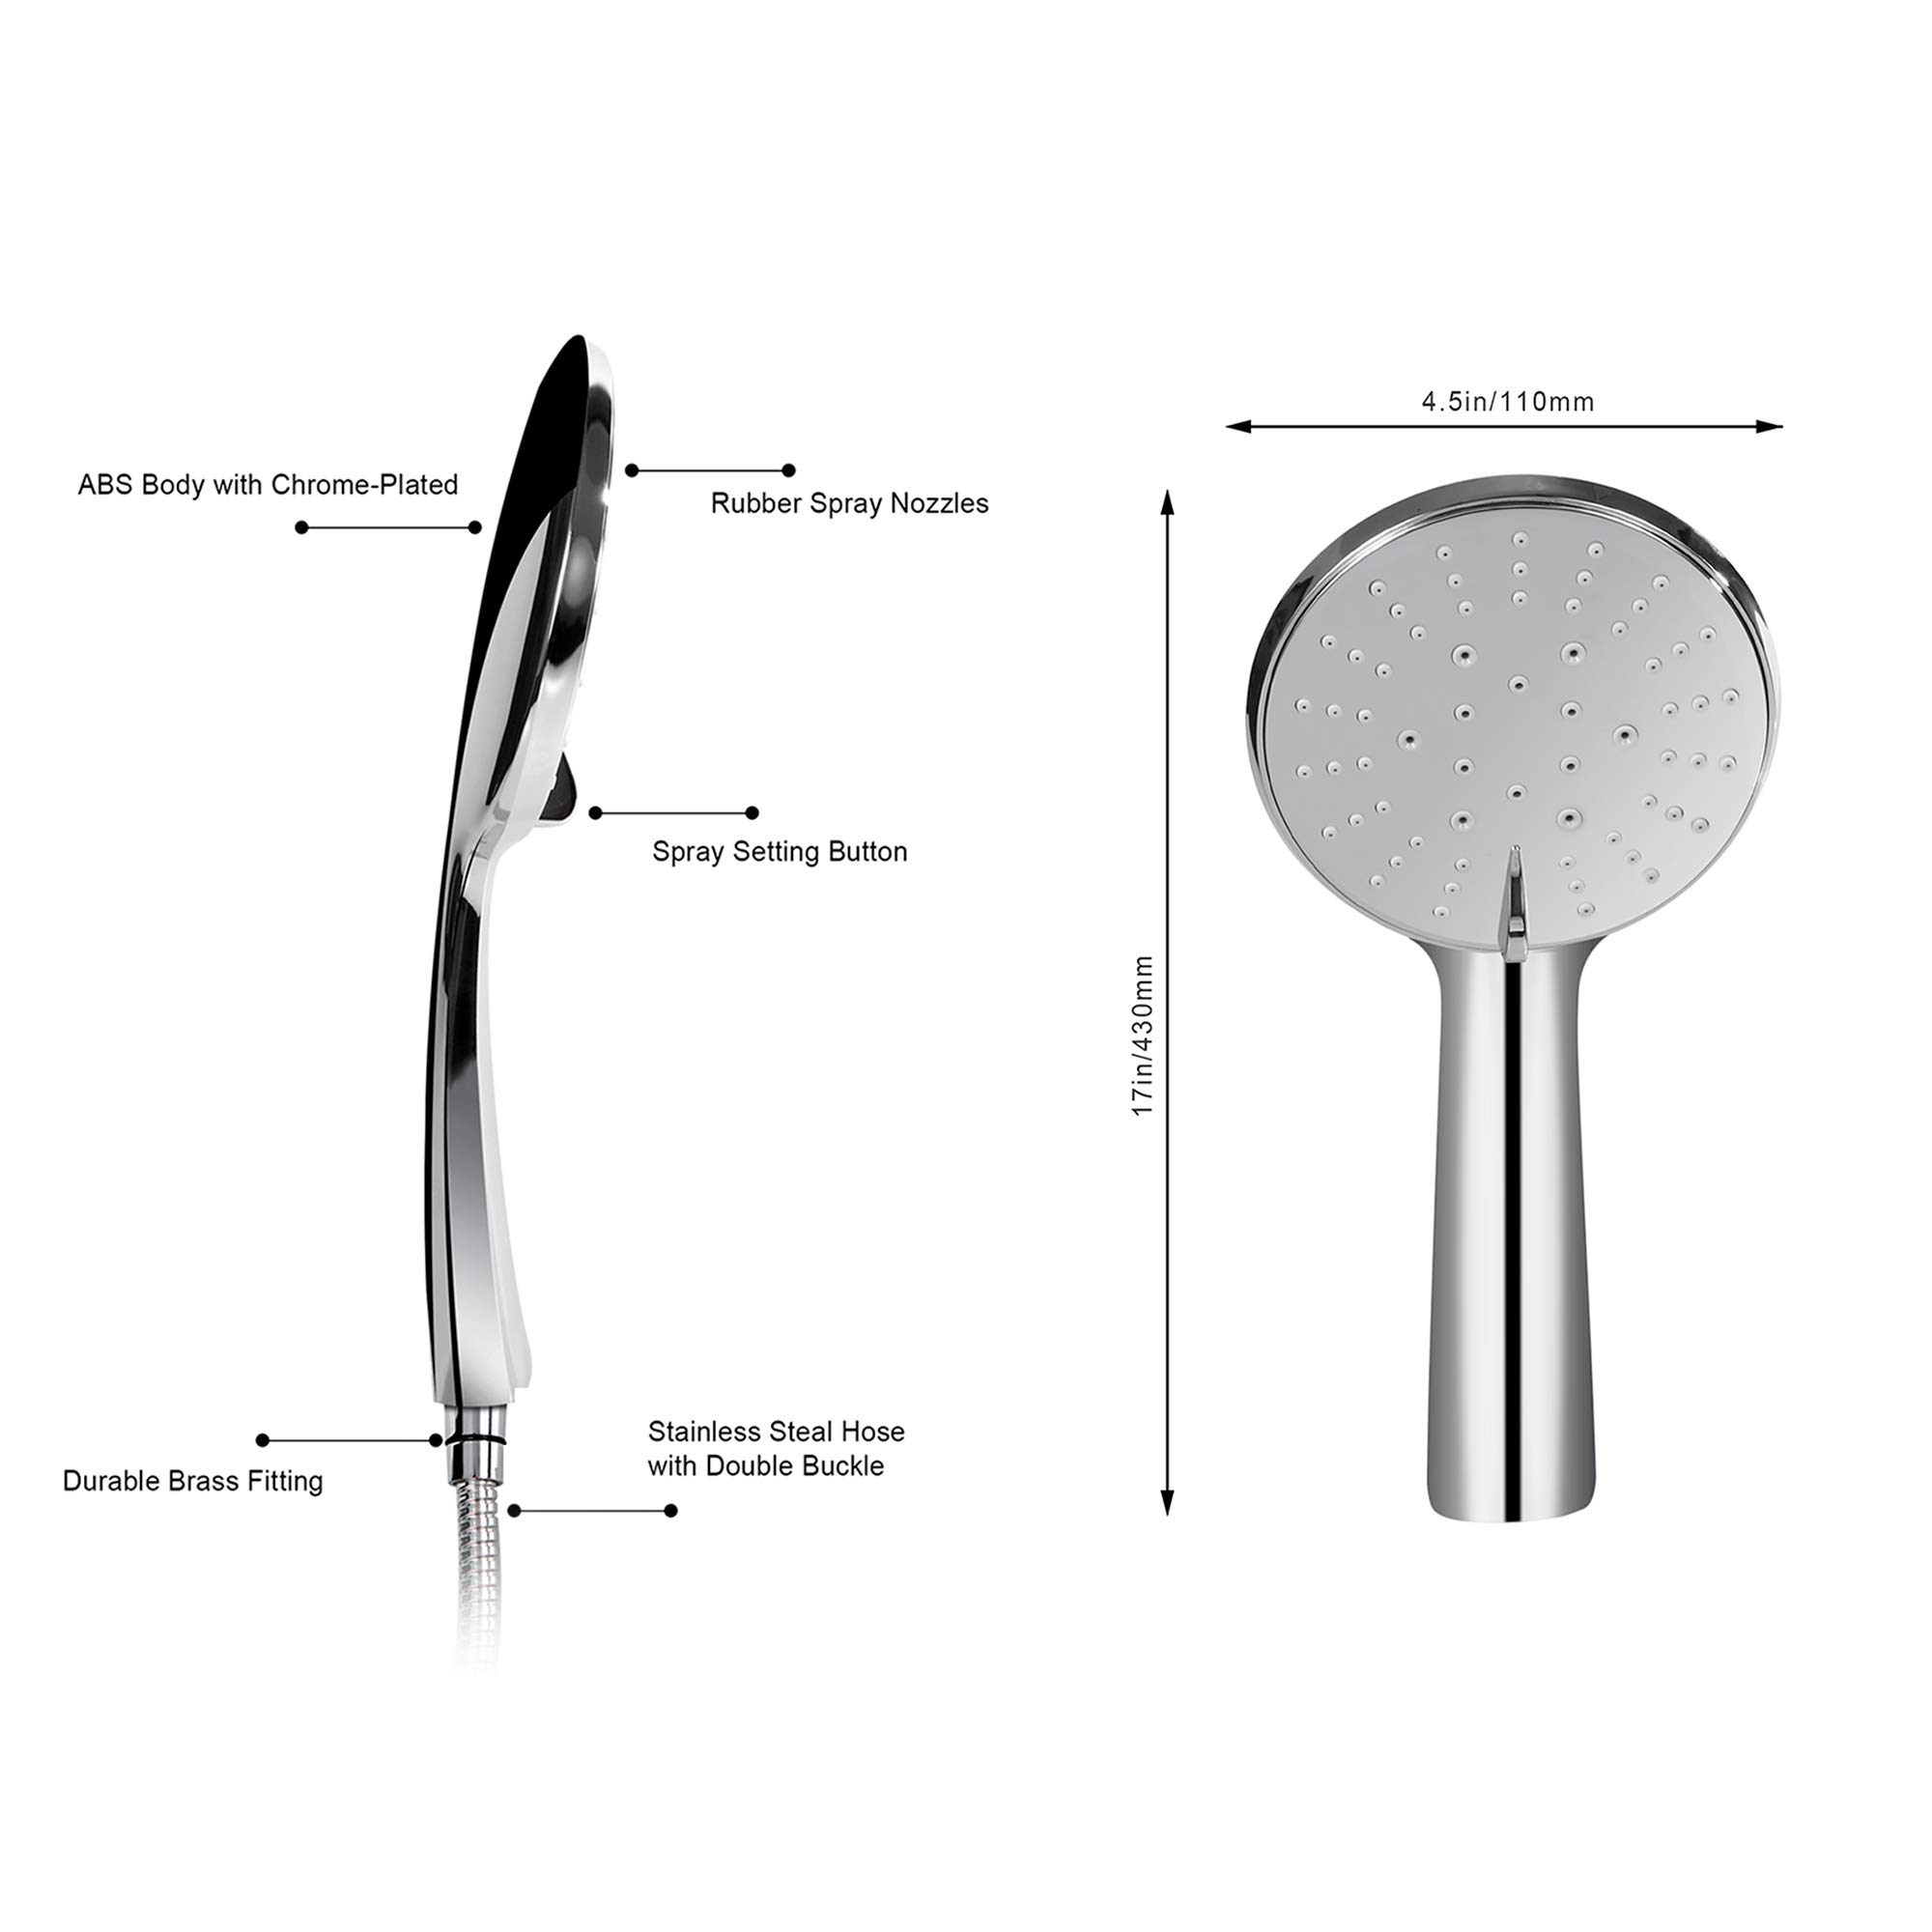 Bathroom Shower Head Kit with 1.5M Stainless Steel Shower Hose, Handheld 3 Spray Water Flow Options Adjustable Head Set, Water Saving Mode, Full Chrome